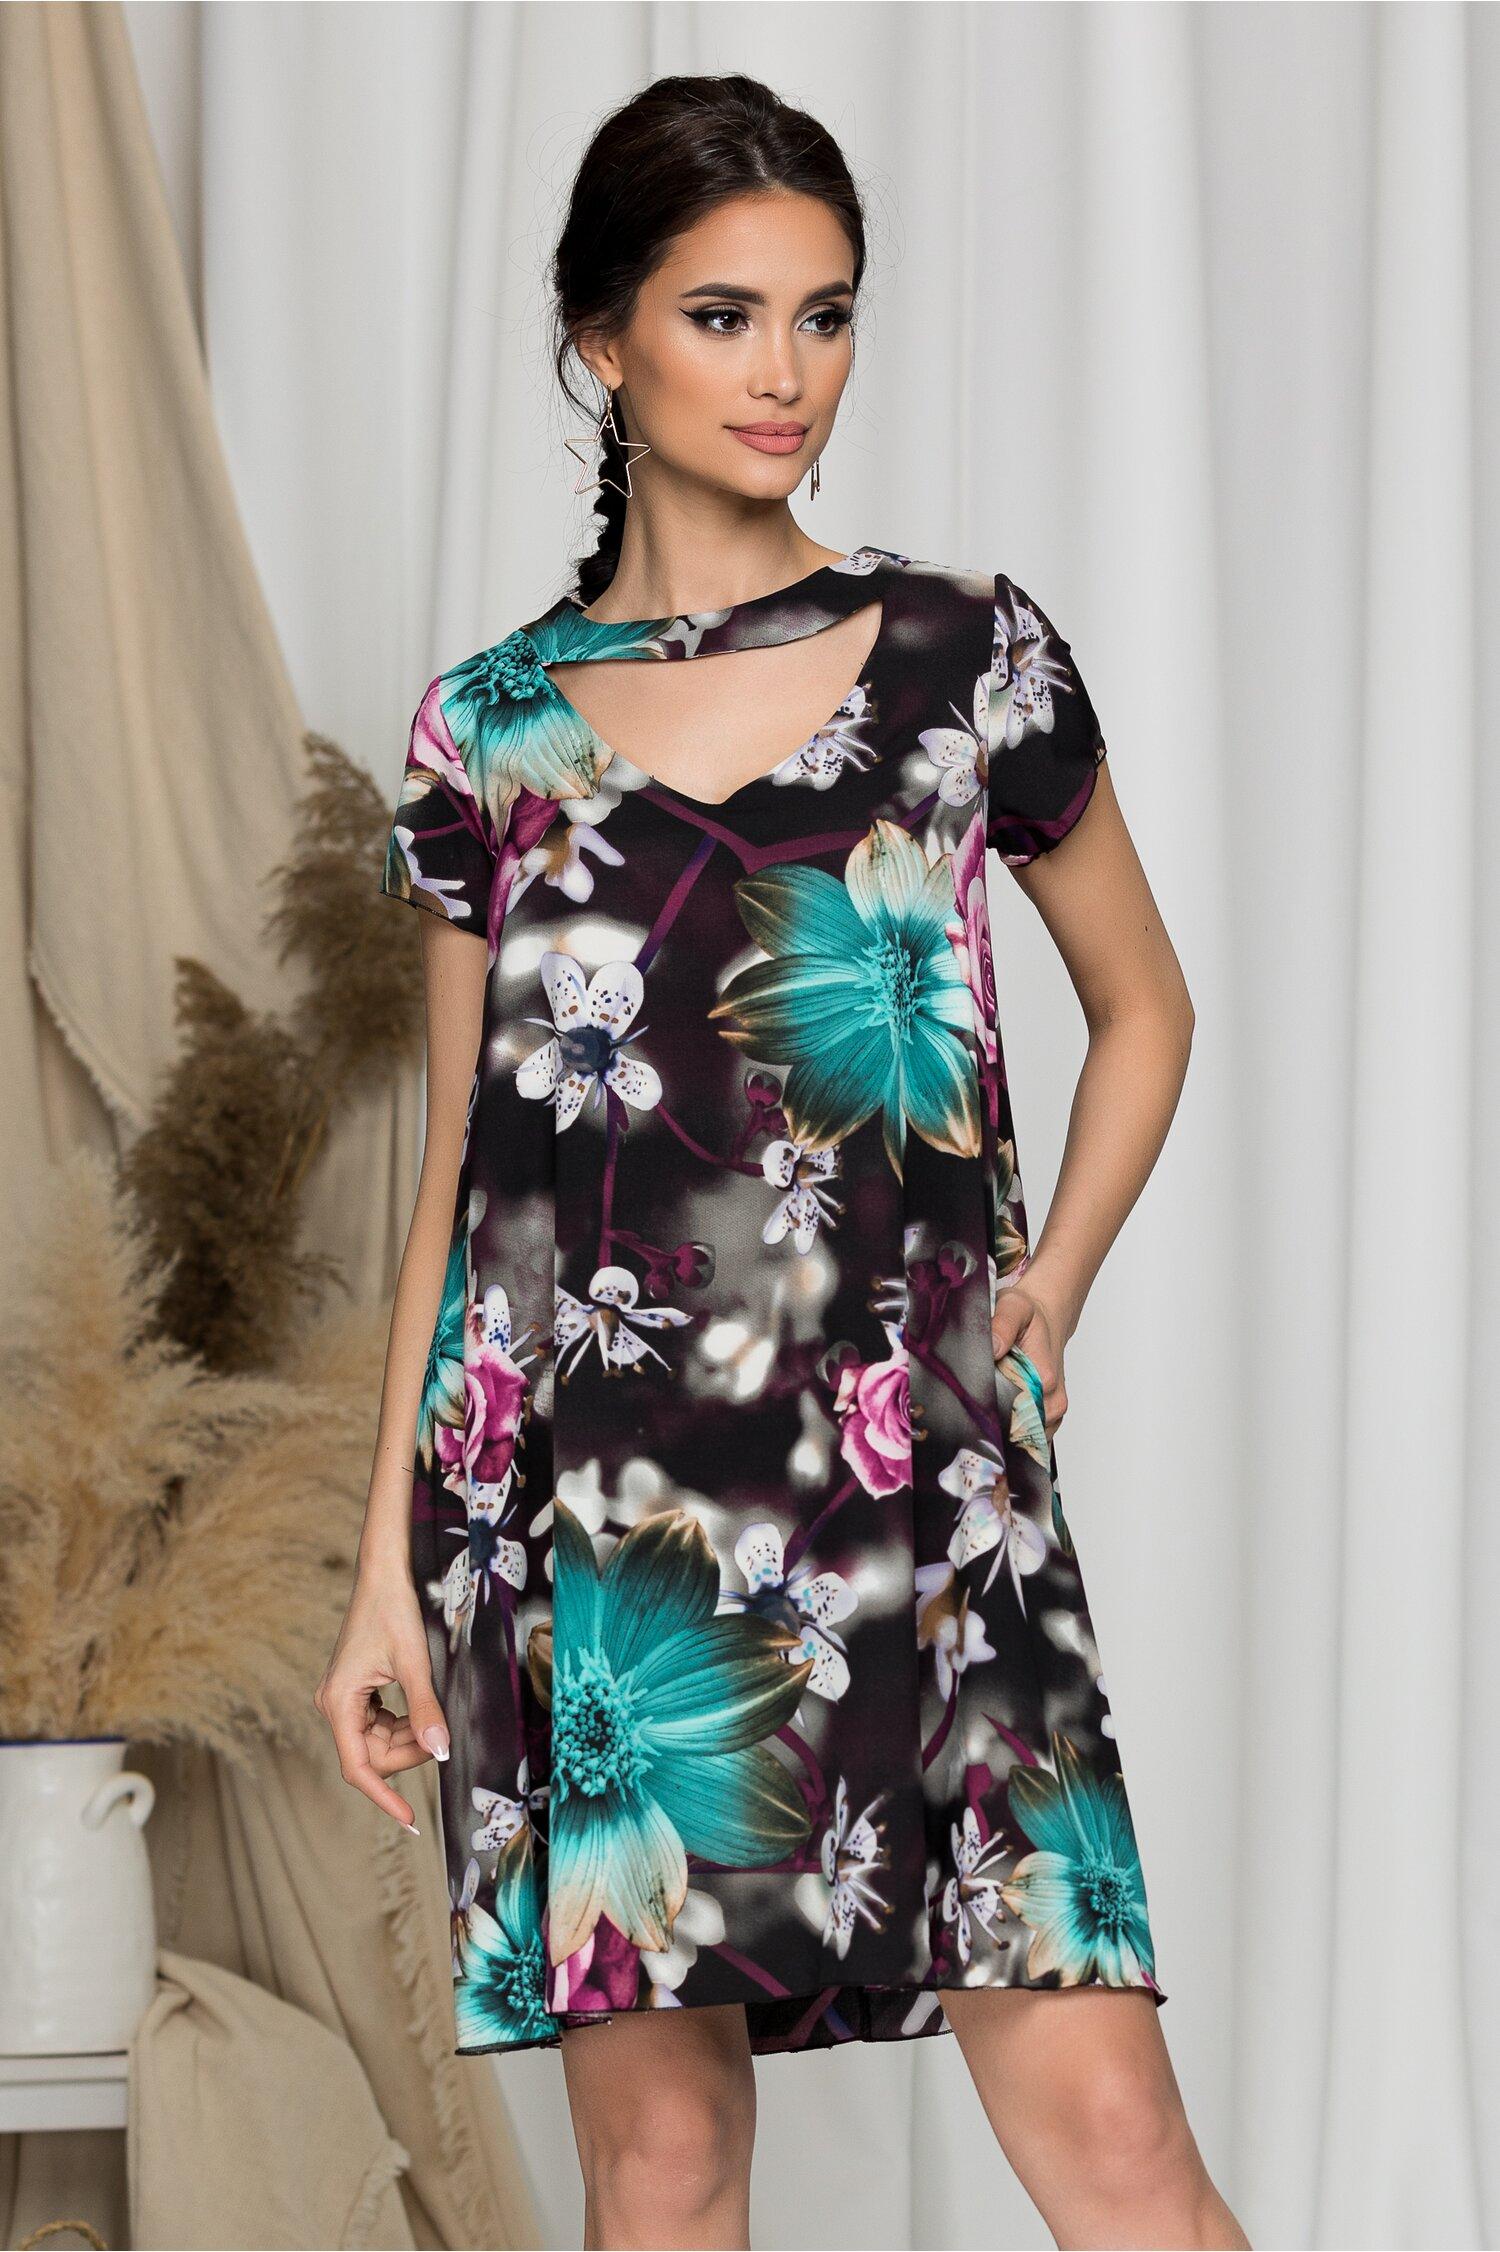 Rochie Maribel evazata neagra cu flori turcoaz si lila